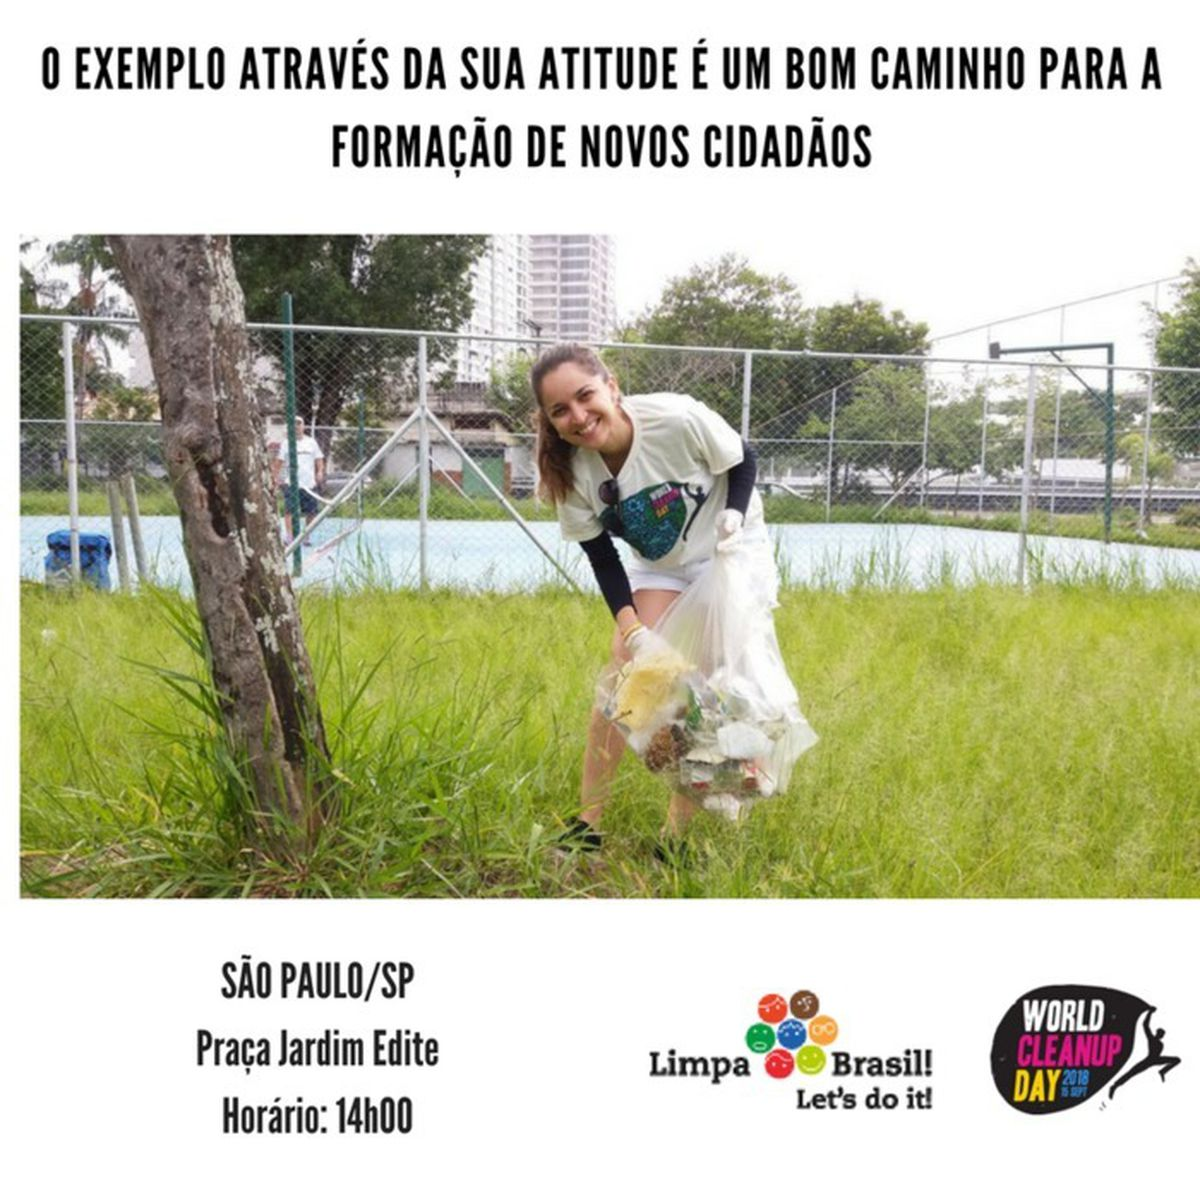 World Clean Up Day - Limpa Brasil - São Paulo (24/03)